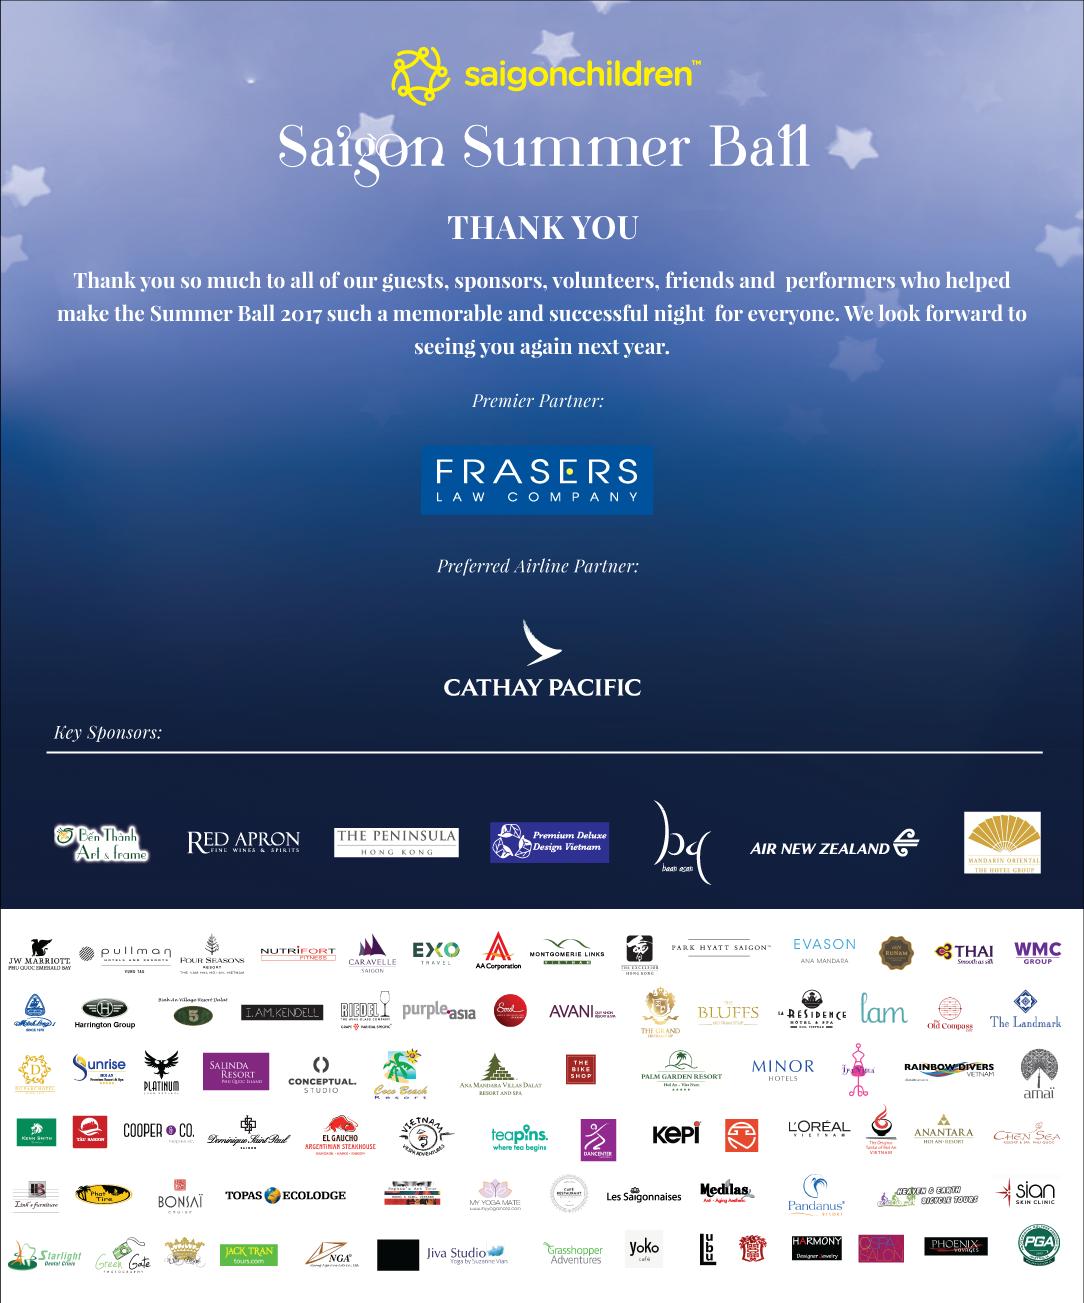 Saigon Summer Ball 2017 - Saigon Children's Charity CIO